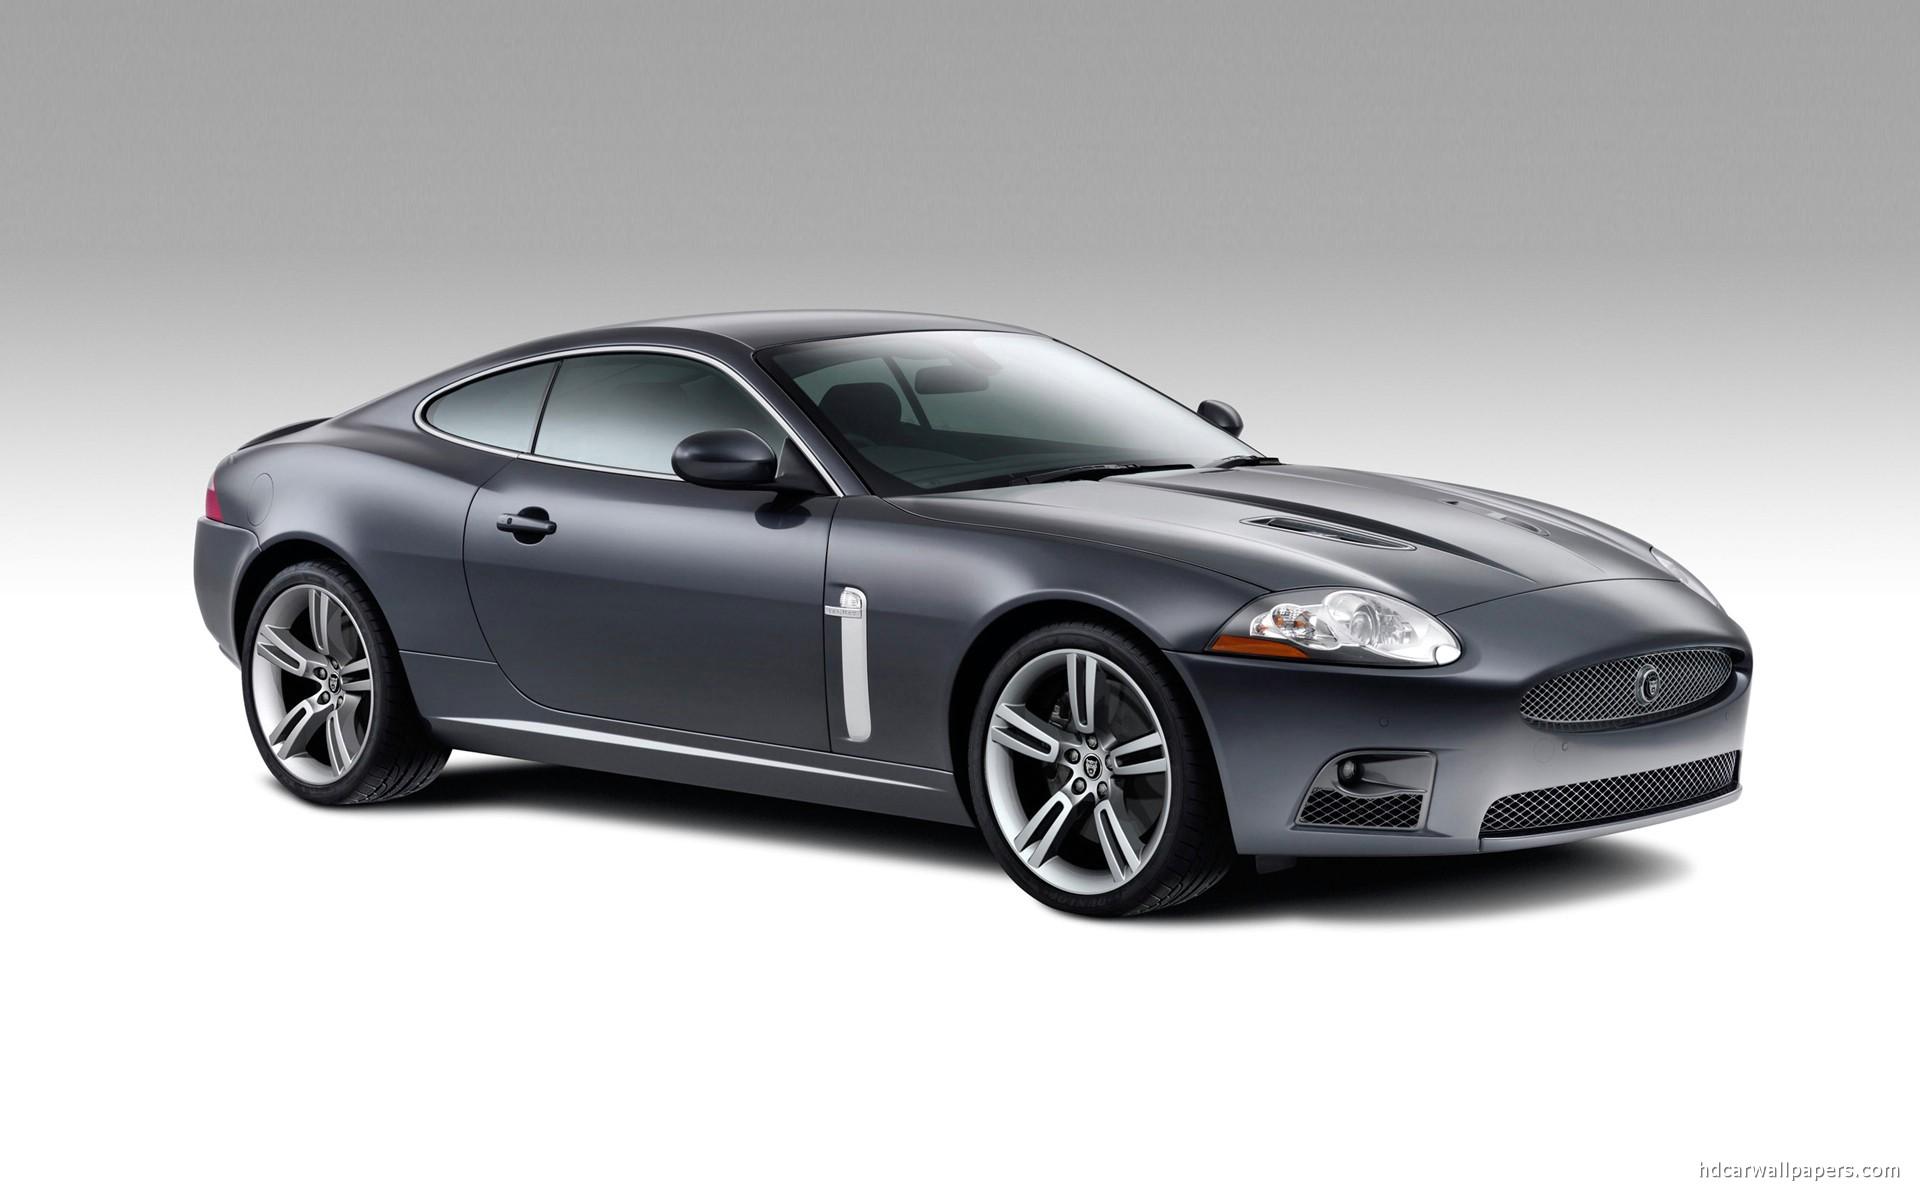 Wallpaper download jaguar - Jaguar Xkr